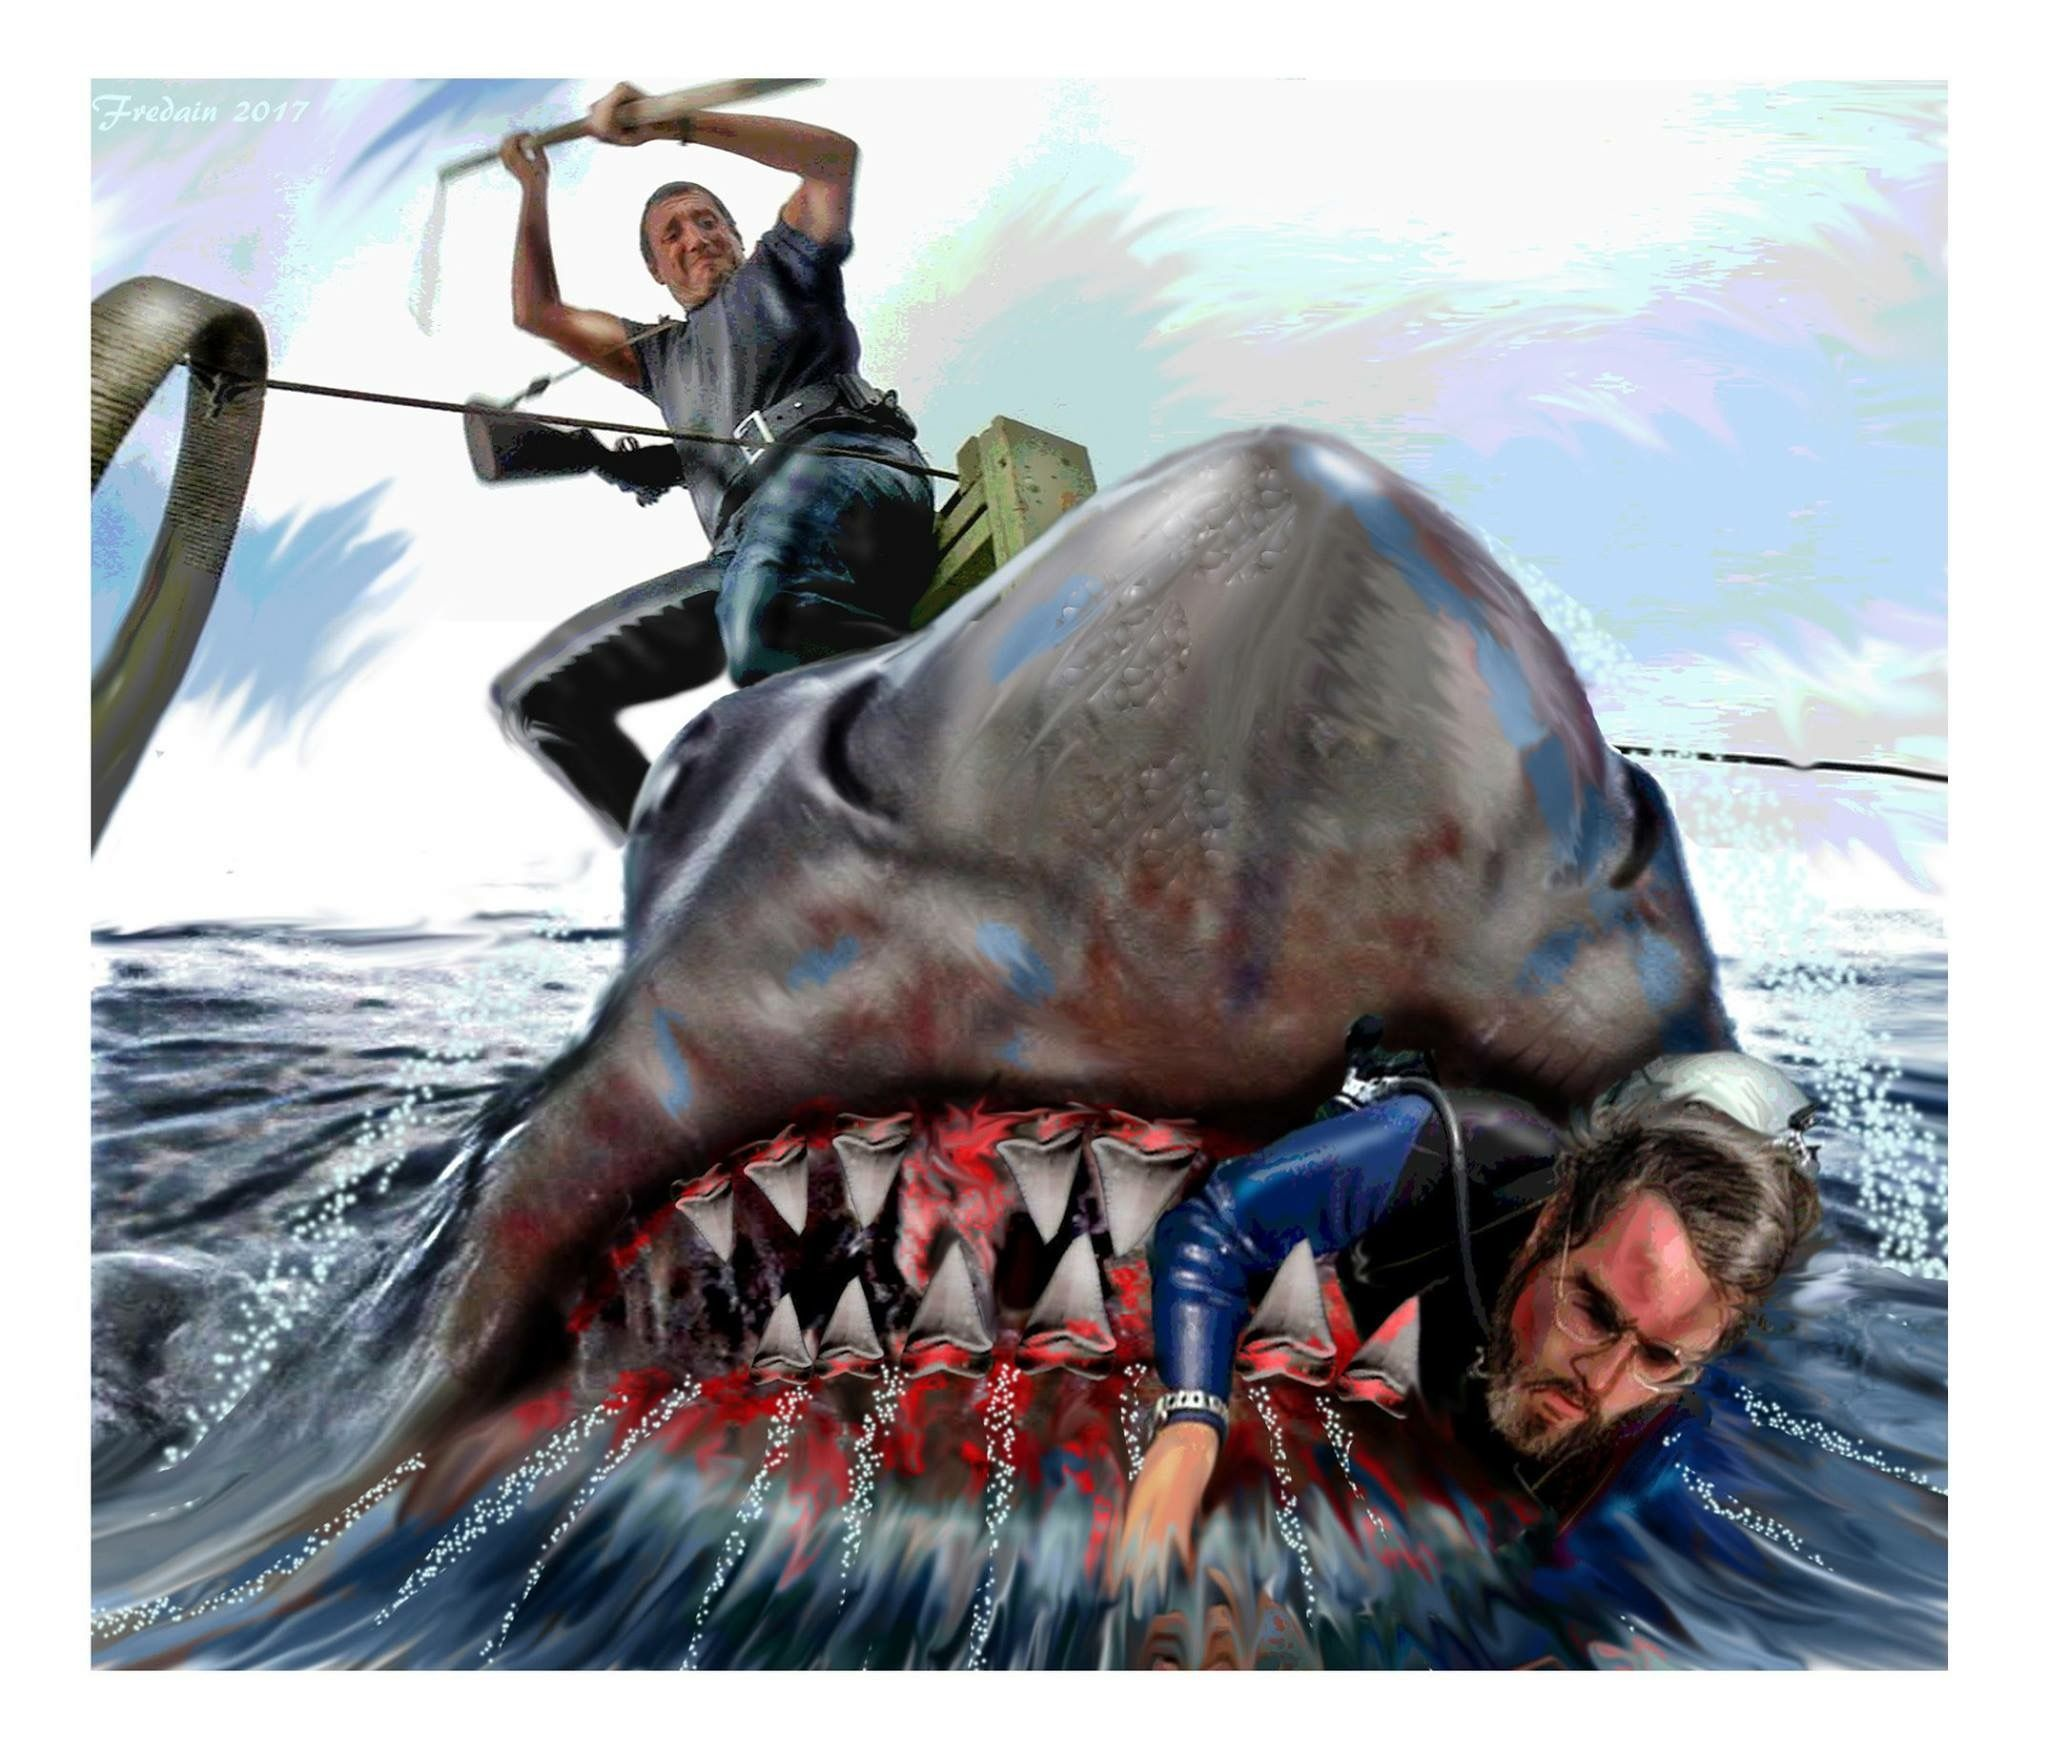 Pin By David Maciorkowski On Jaws Movies Scary Sea Creatures Shark Art Ocean Creatures